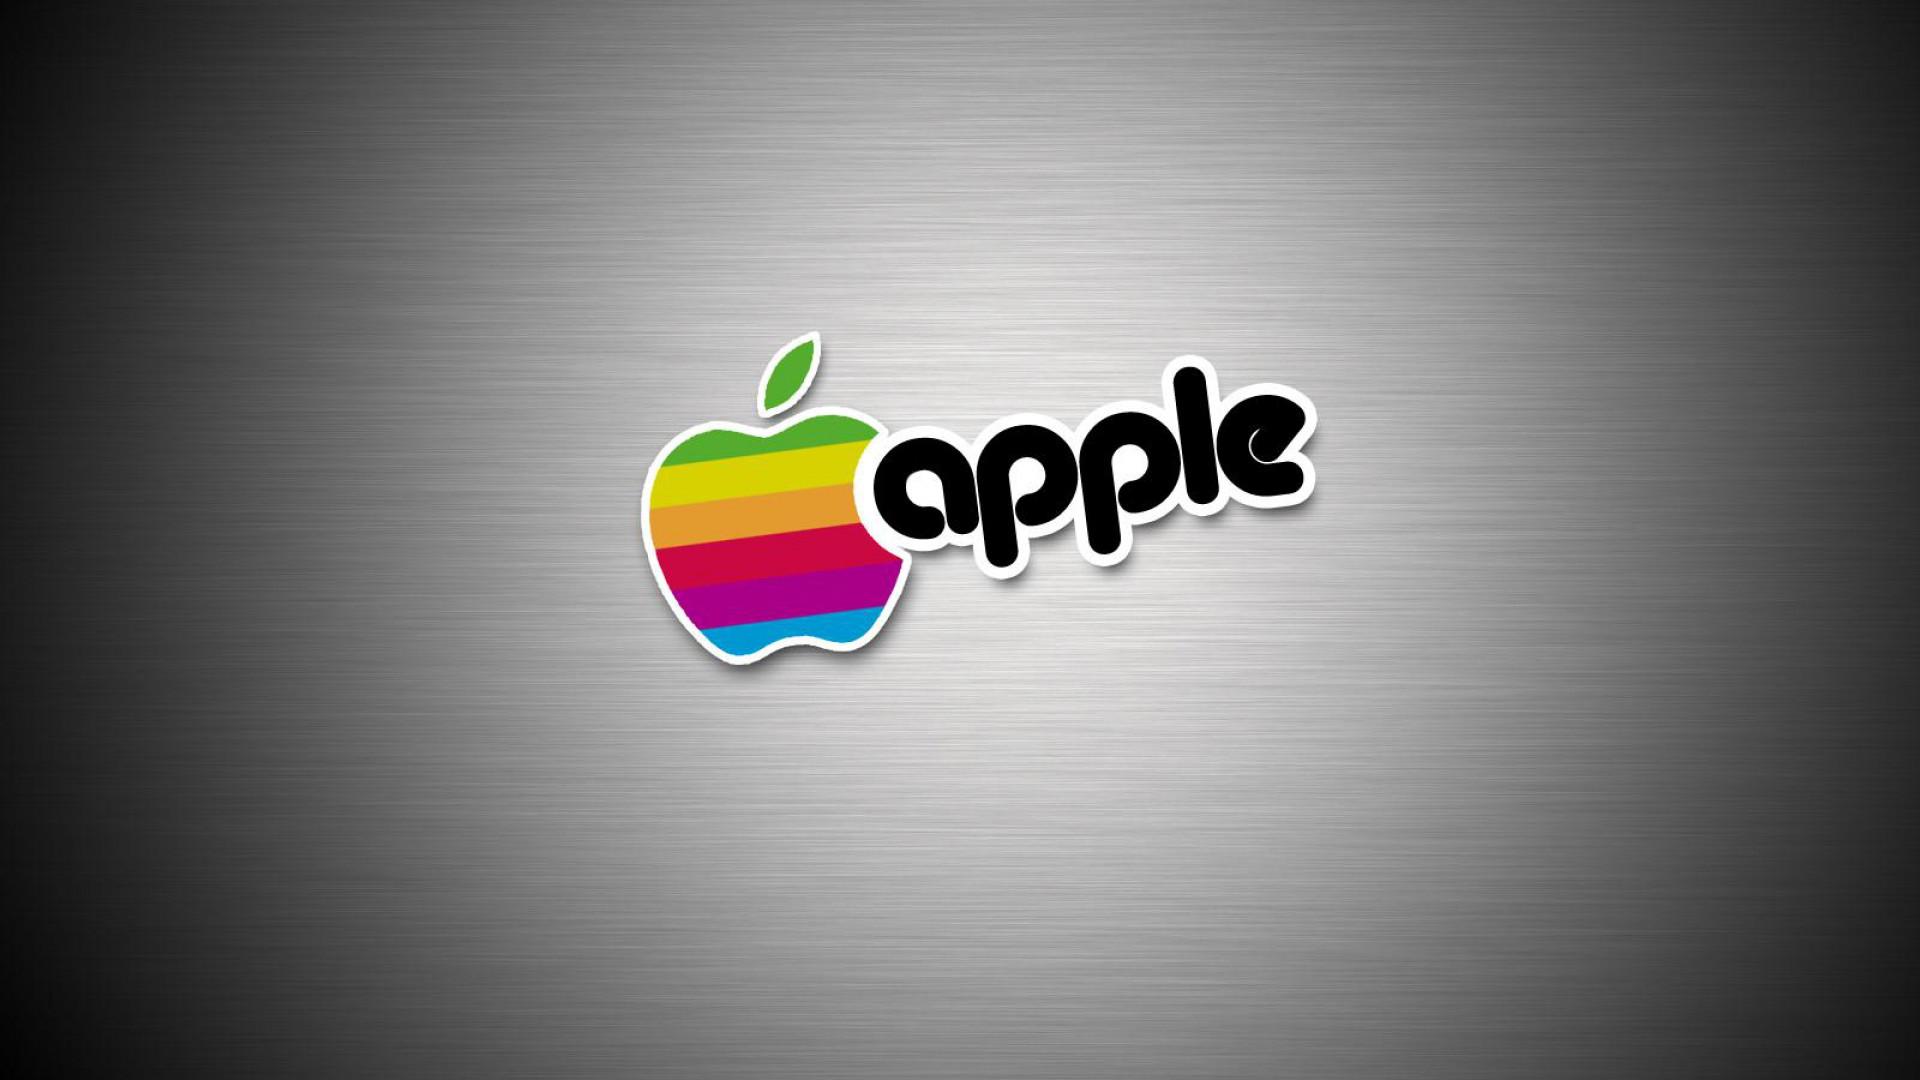 Apple Logo Wallpapers HD rainbow text